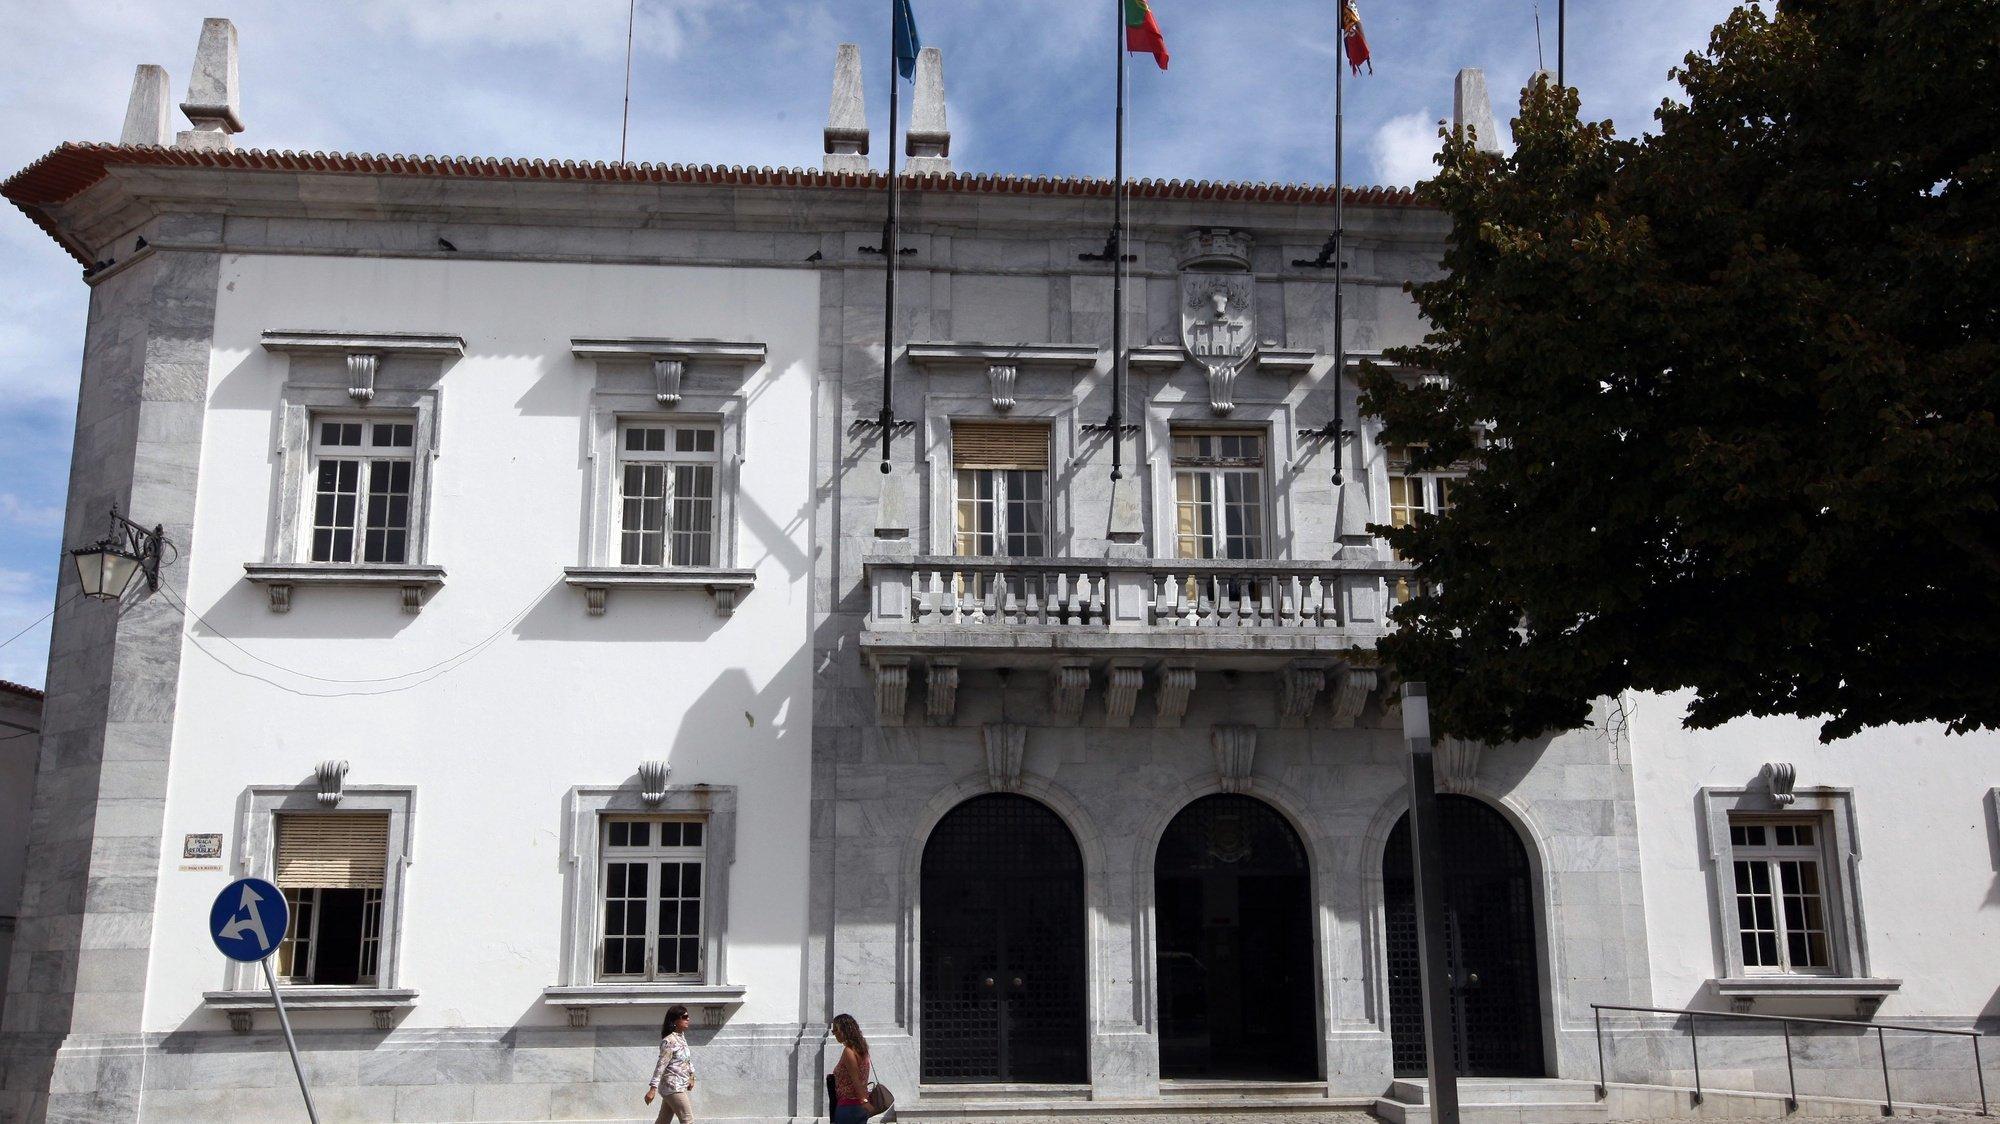 Edifício da Câmara Municipal de Beja, 3 de outubro de 2013. NUNO VEIGA/LUSA